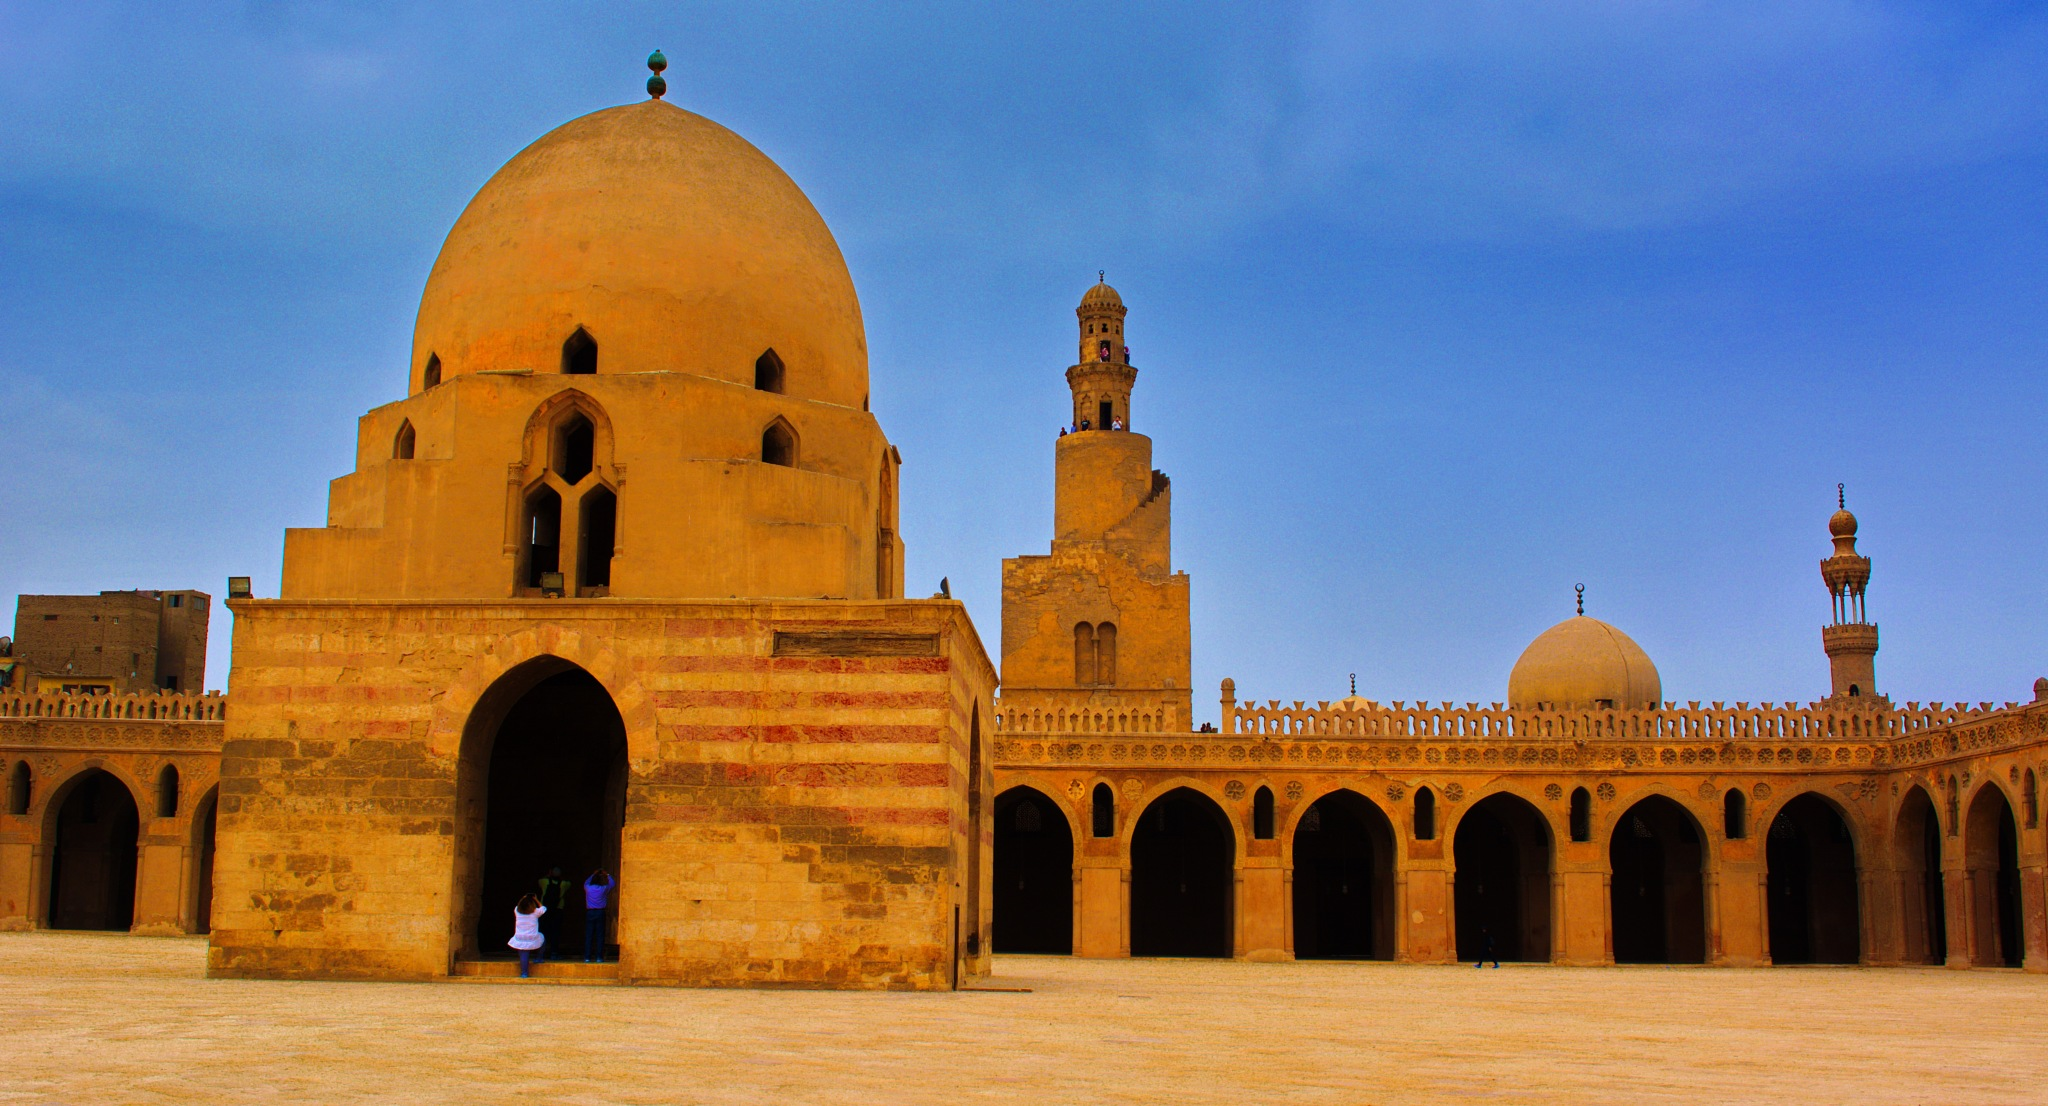 Landmarks of Egypt Al Mahrousa ... Mosque of Sultan Ahmad Ibn Tulun by ragab ramzy elhamamy